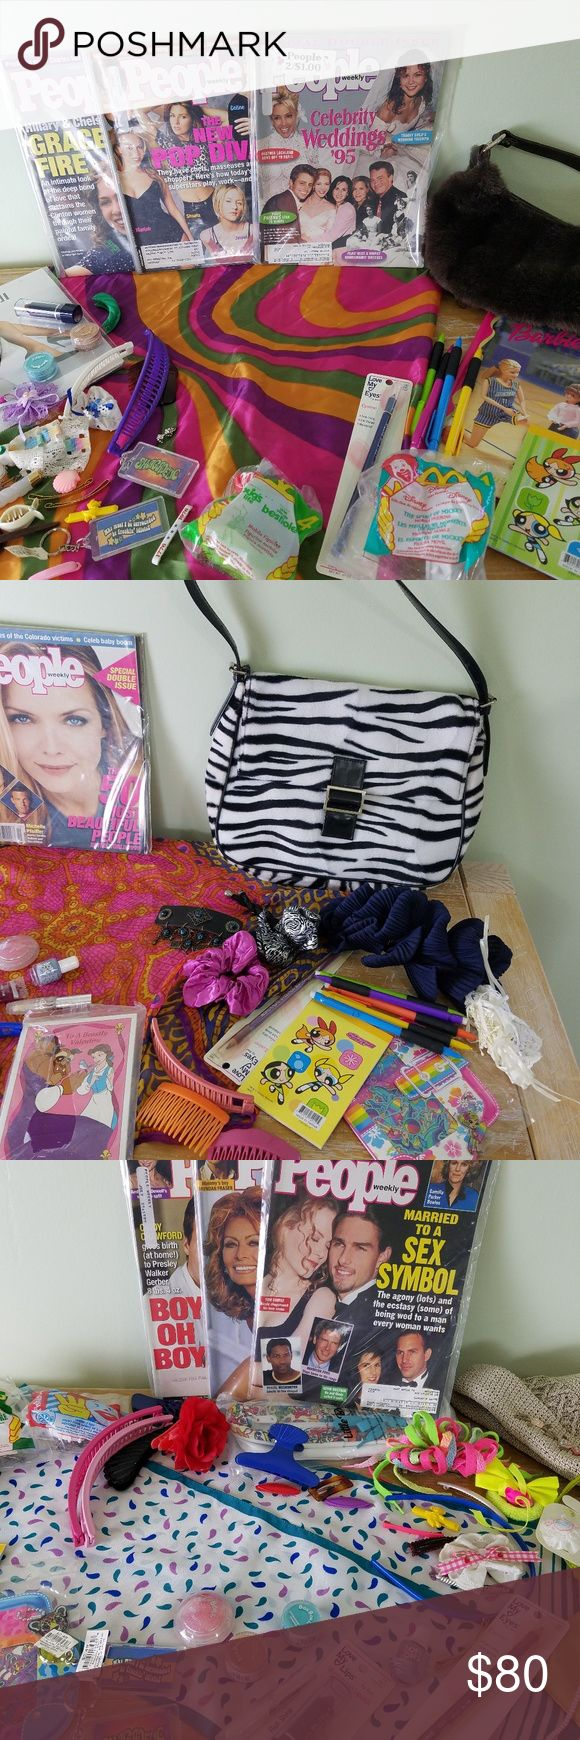 15 pc box of 90s / y2k items Powerpuff girls makeup